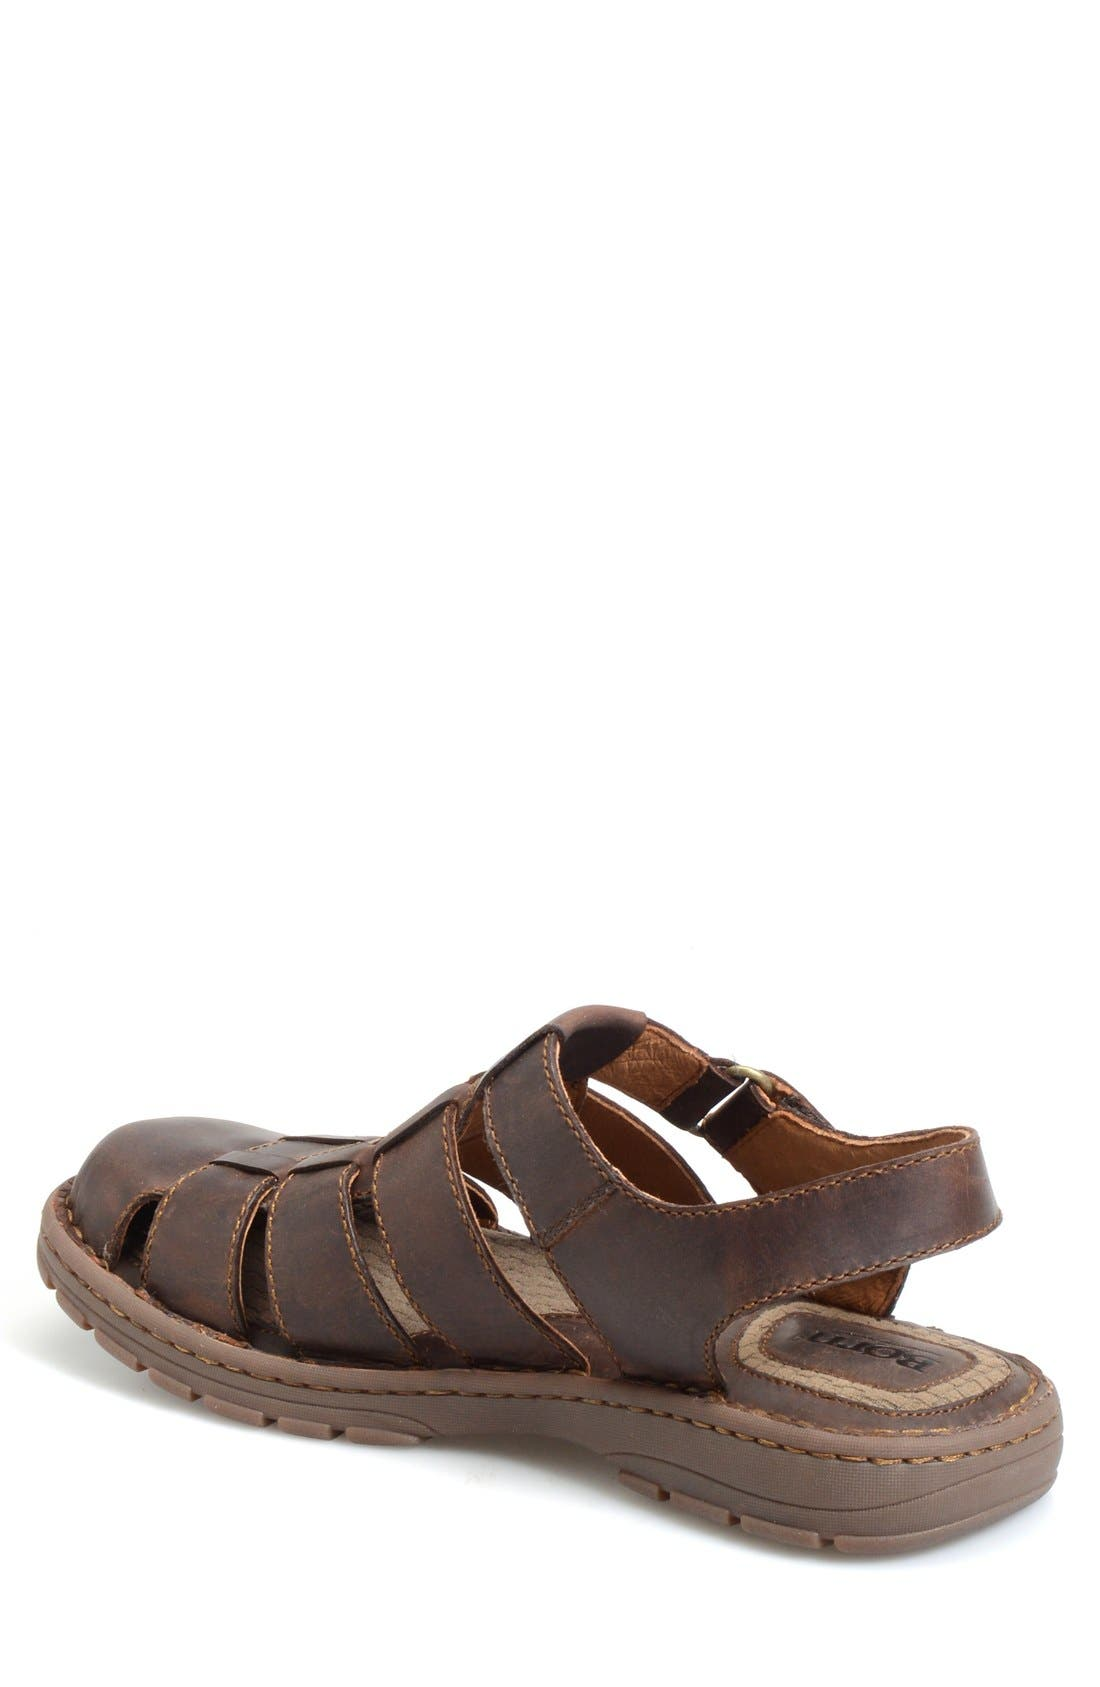 'Osmond' Leather Sandal,                             Alternate thumbnail 2, color,                             Mink